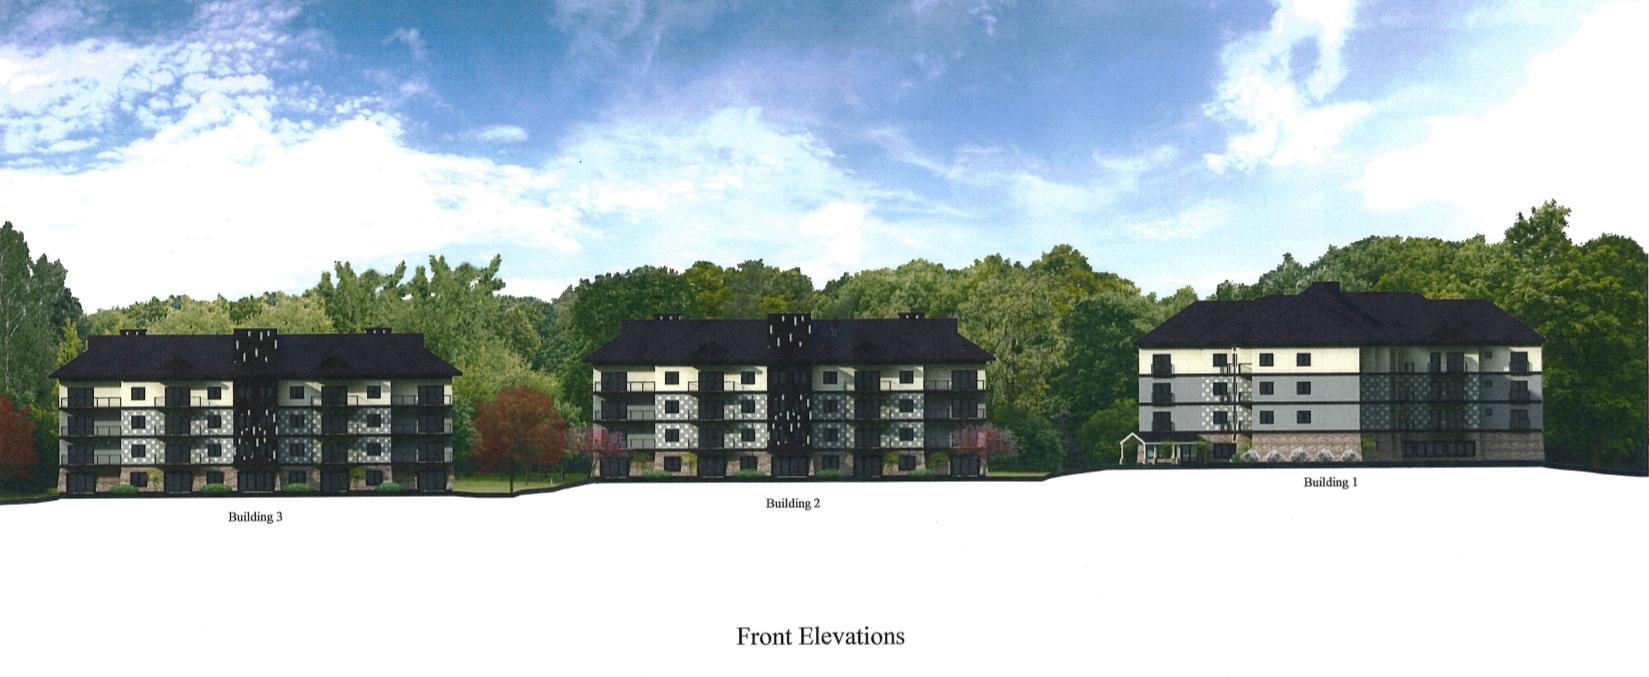 The Enclave At Kerlin Farm - Cheltenham - Front Elevations.jpg